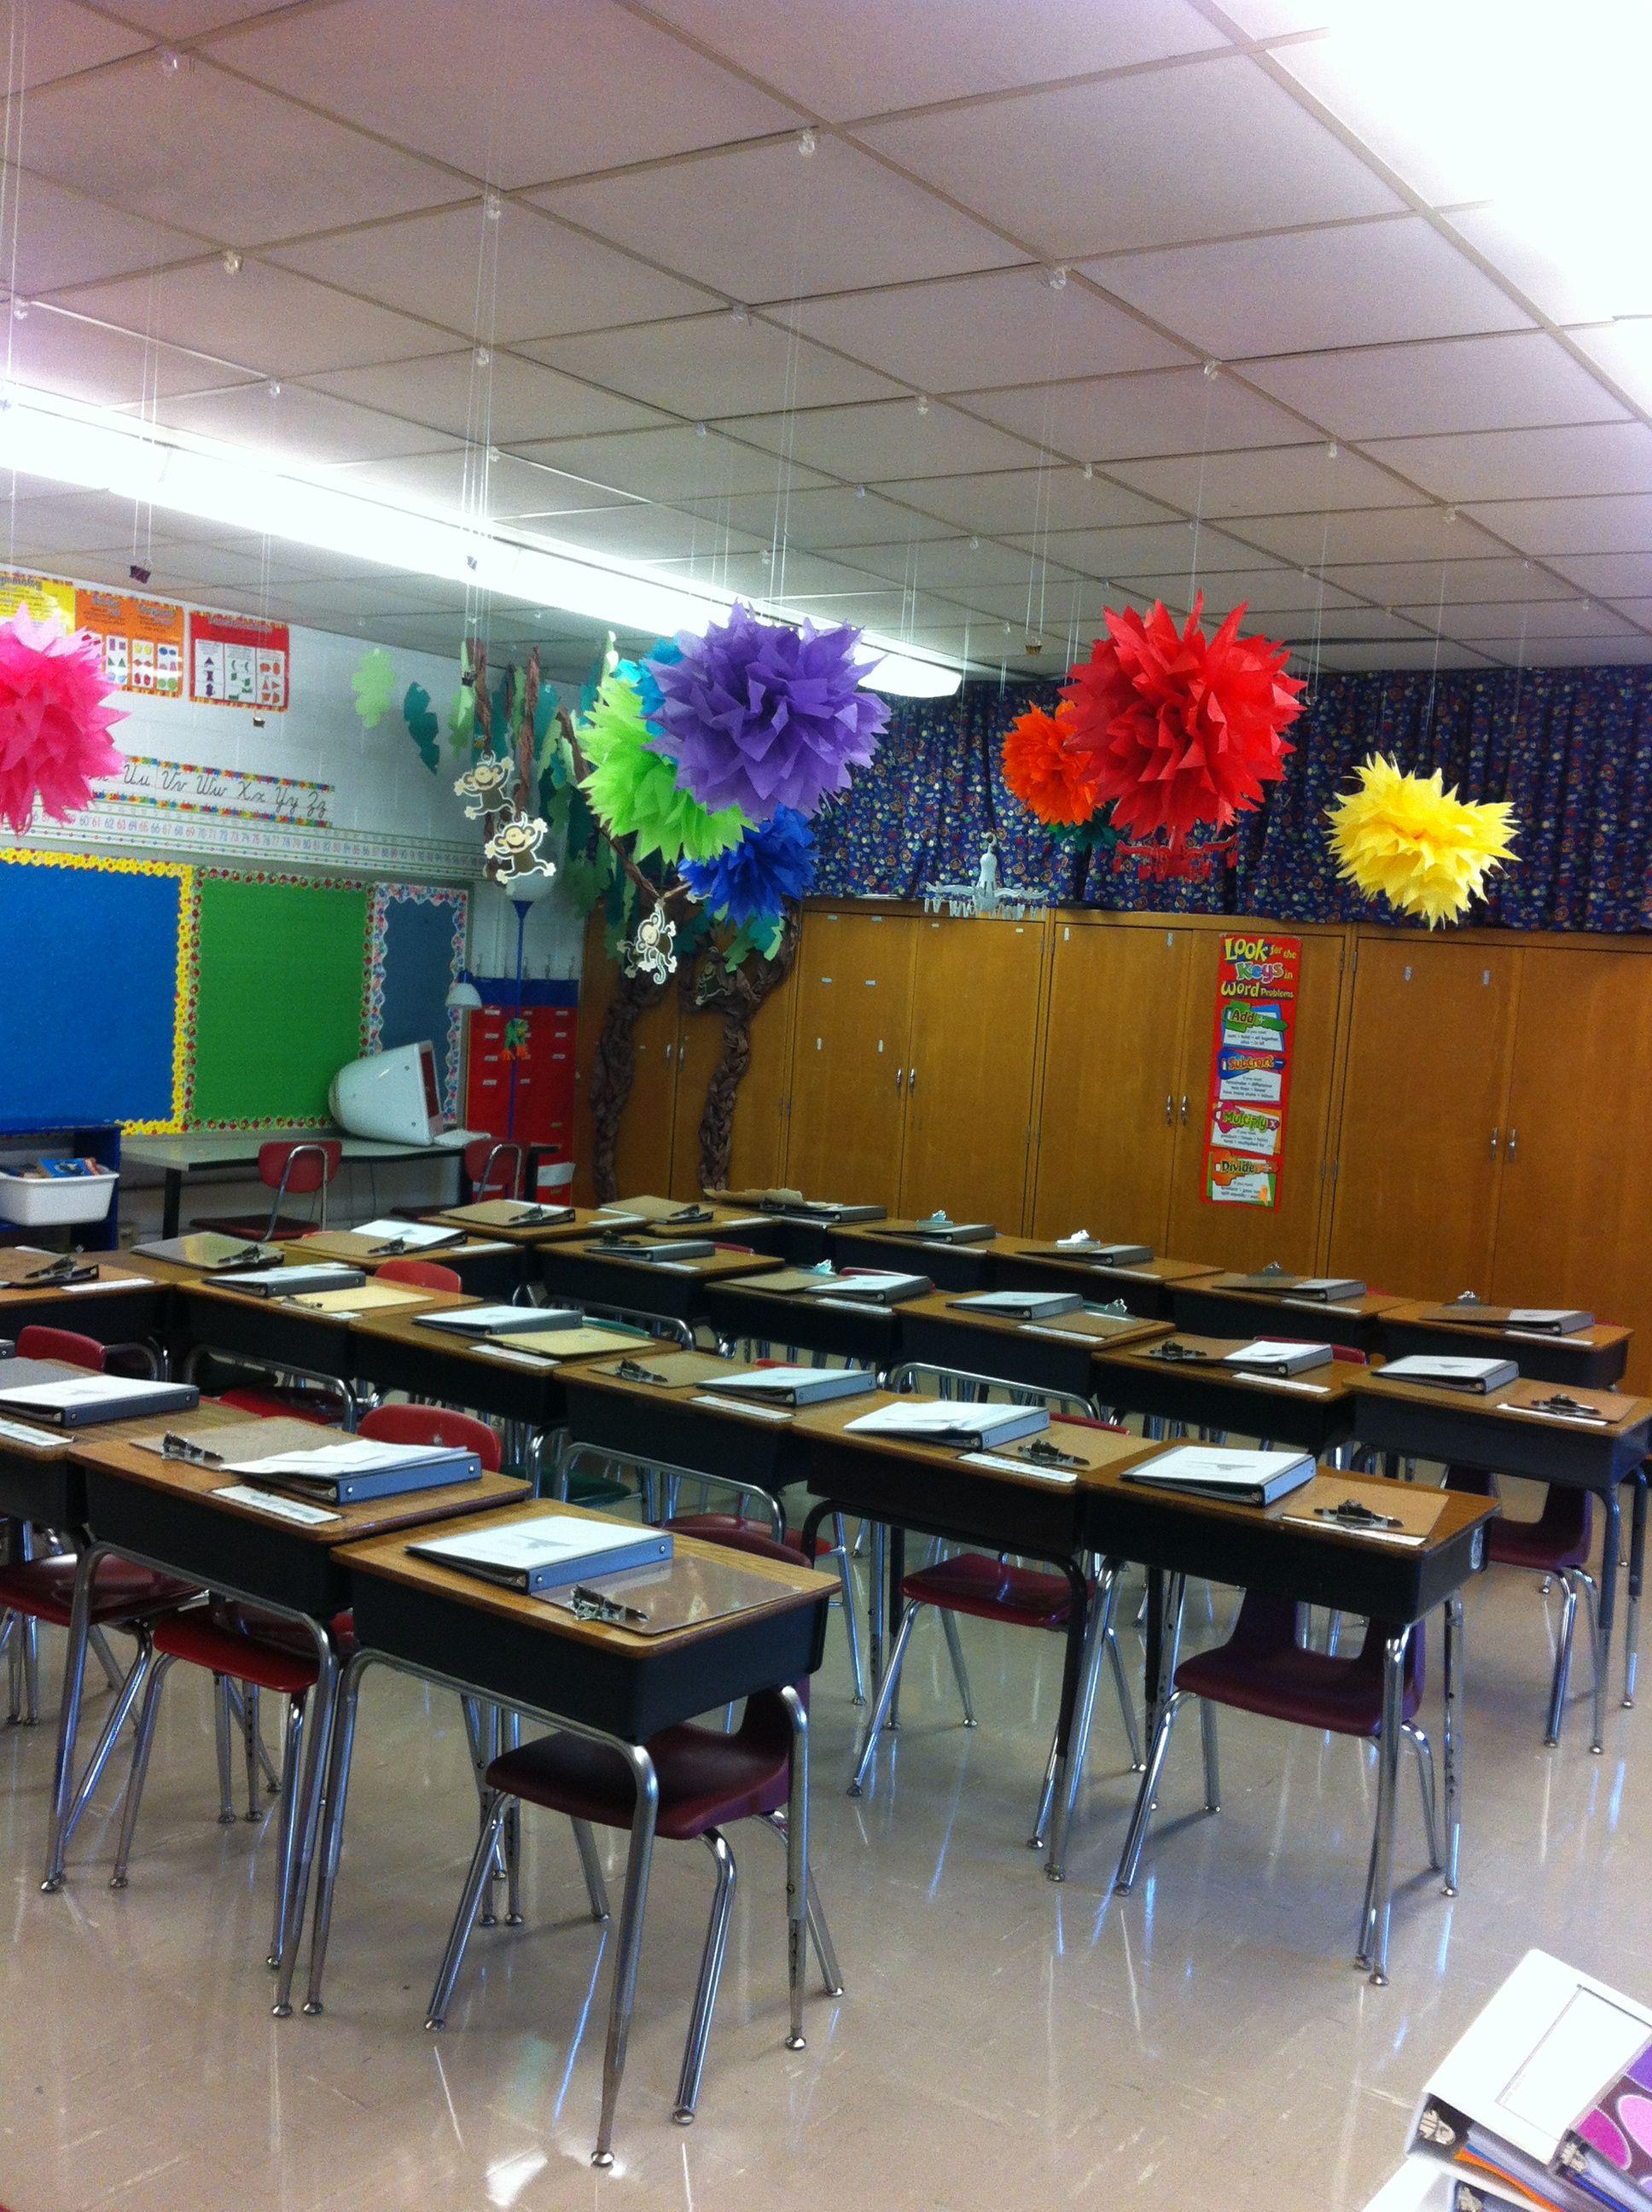 Innovative Classroom Design : Ceiling classroom decorations innovative